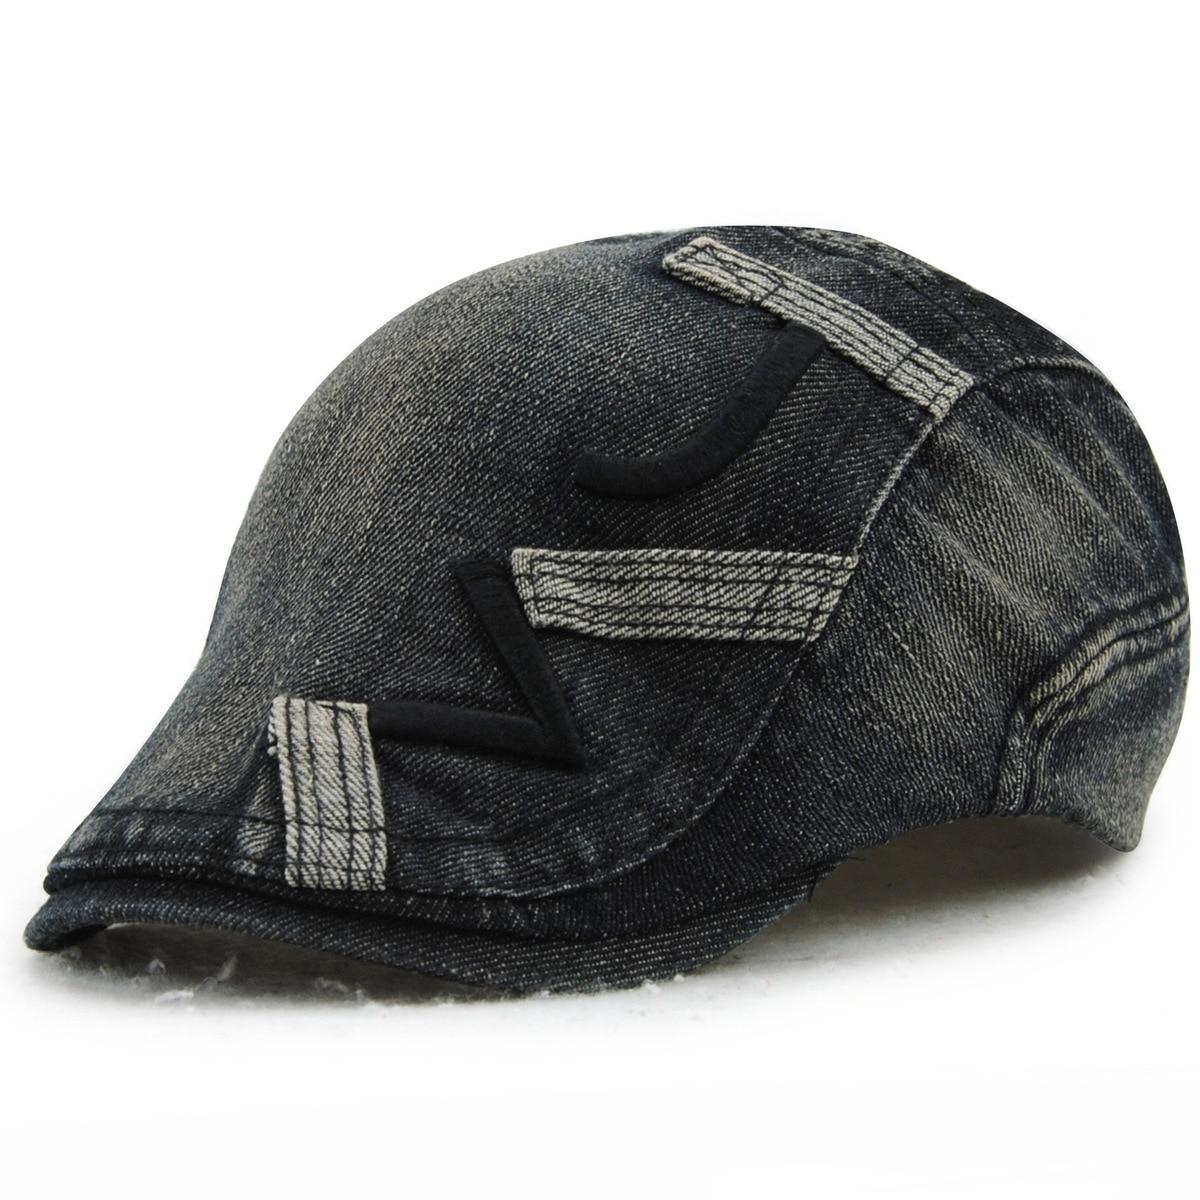 Male Pure Cotton Peaked Cap Men Sun Hat Adult Outdoors Newsboy Caps Daihatsu Scat Wiring Diagram Ivy Women Fashion Wash Old Denim Berets Us269